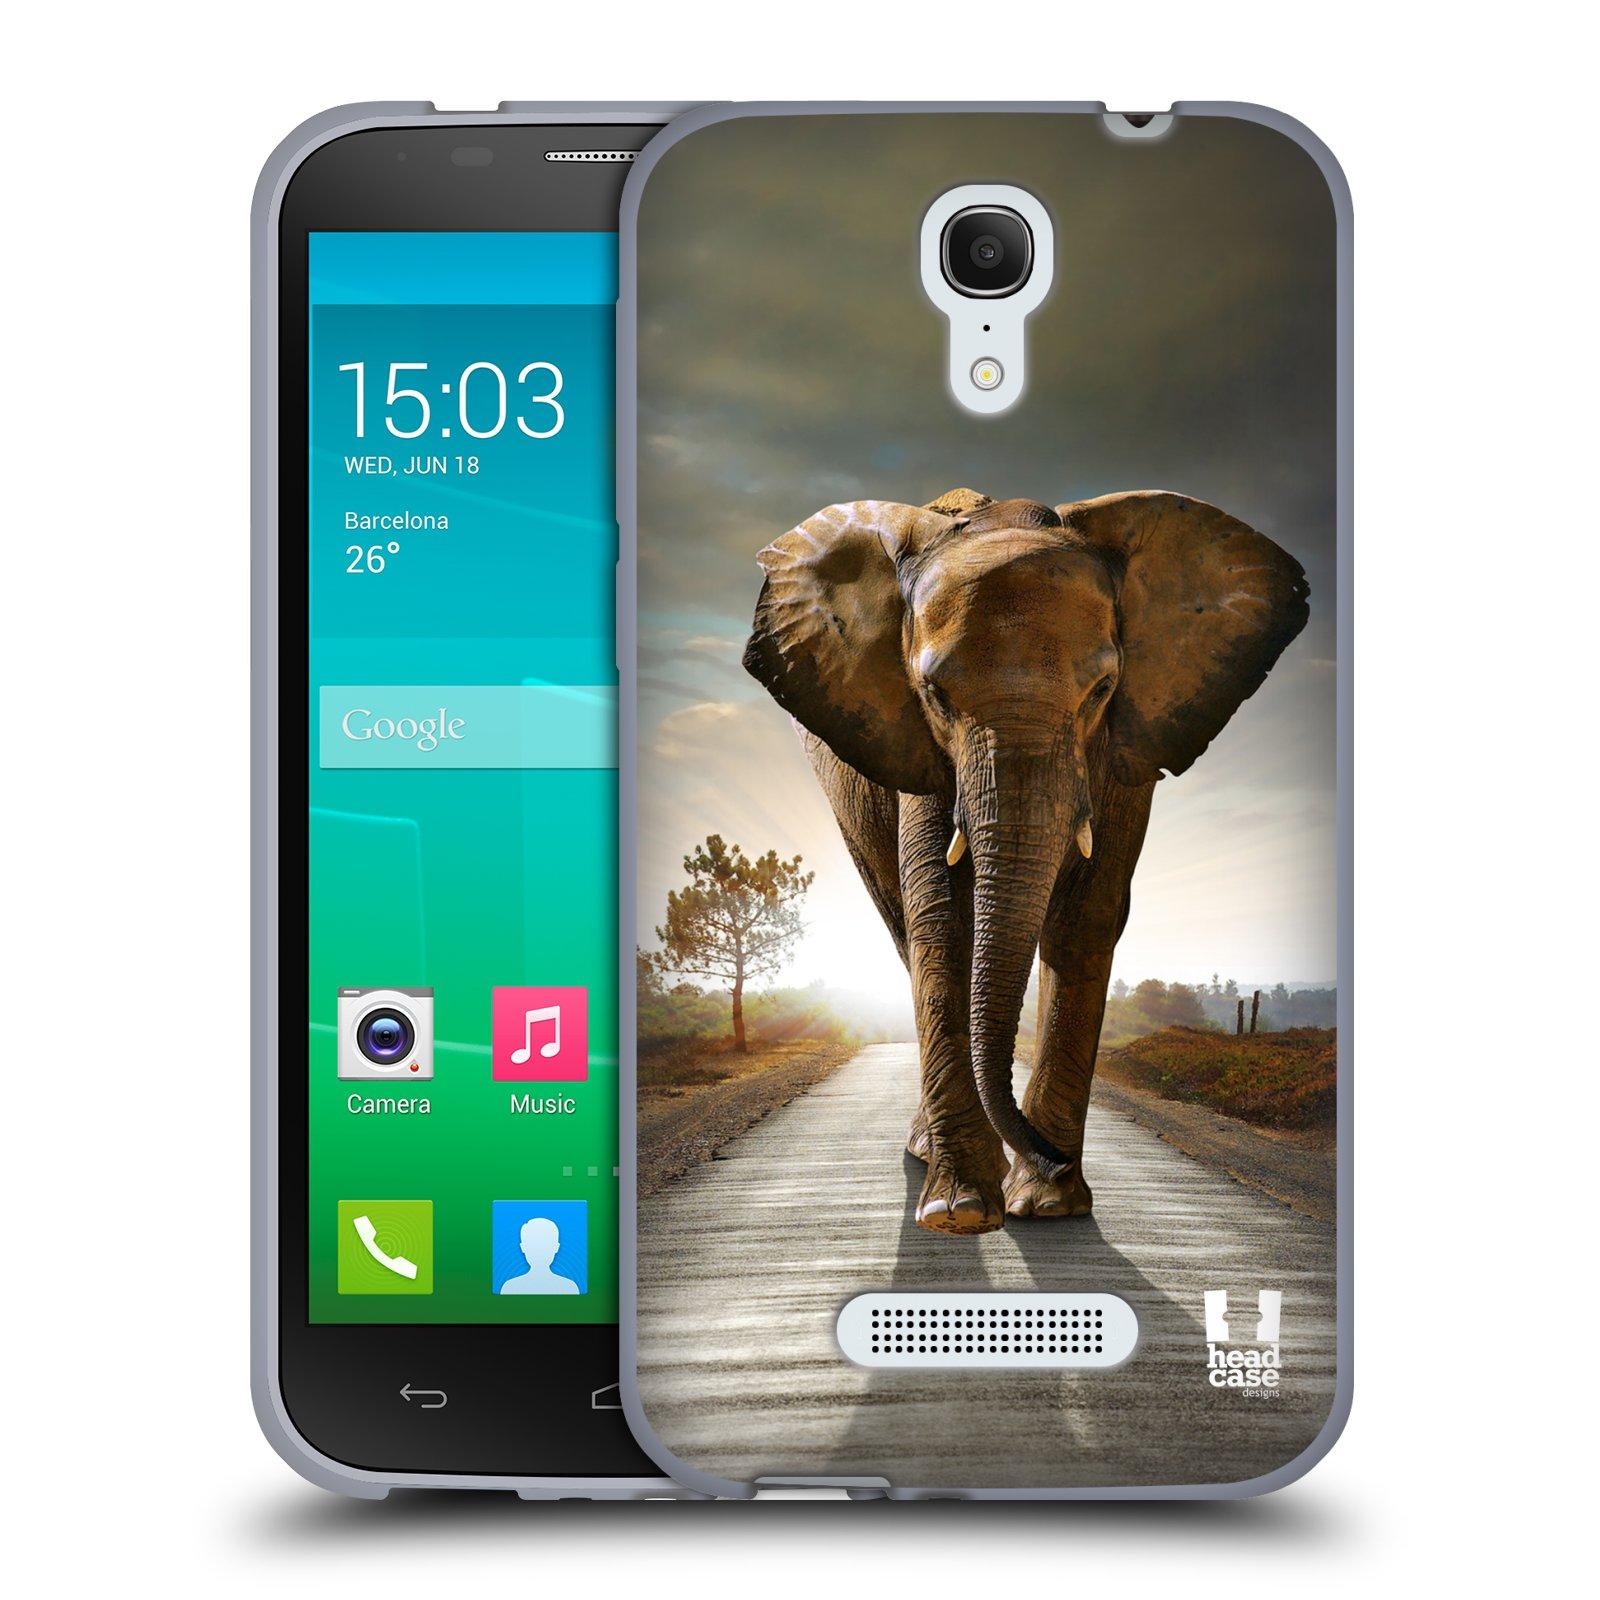 HEAD CASE silikonový obal na mobil Alcatel POP S7 vzor Divočina, Divoký život a zvířata foto AFRIKA KRÁČEJÍCI SLON